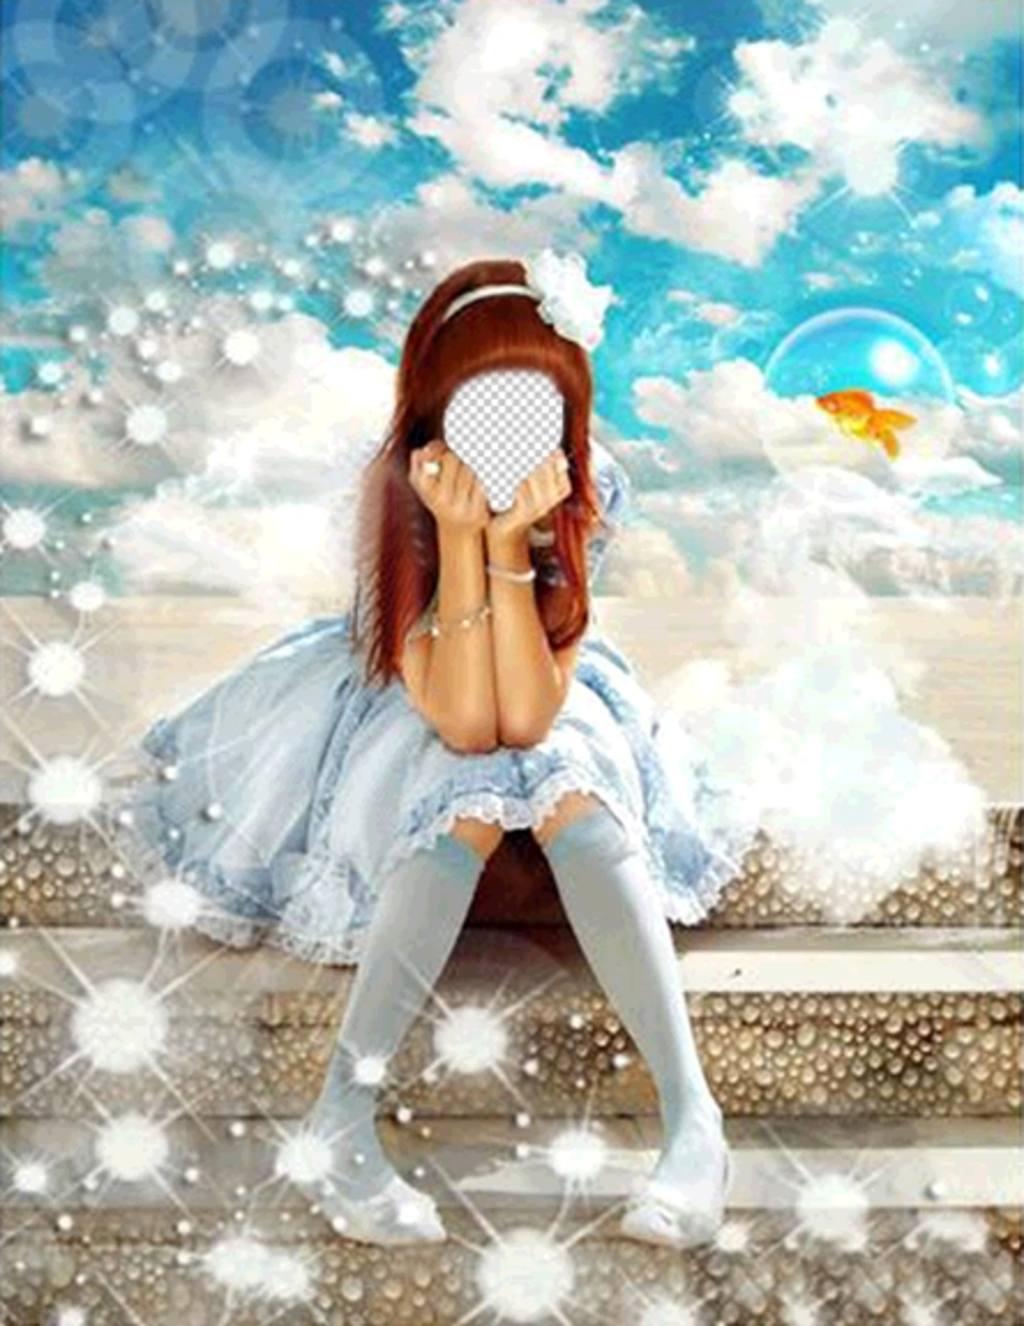 Fotomontajes con vestido azul